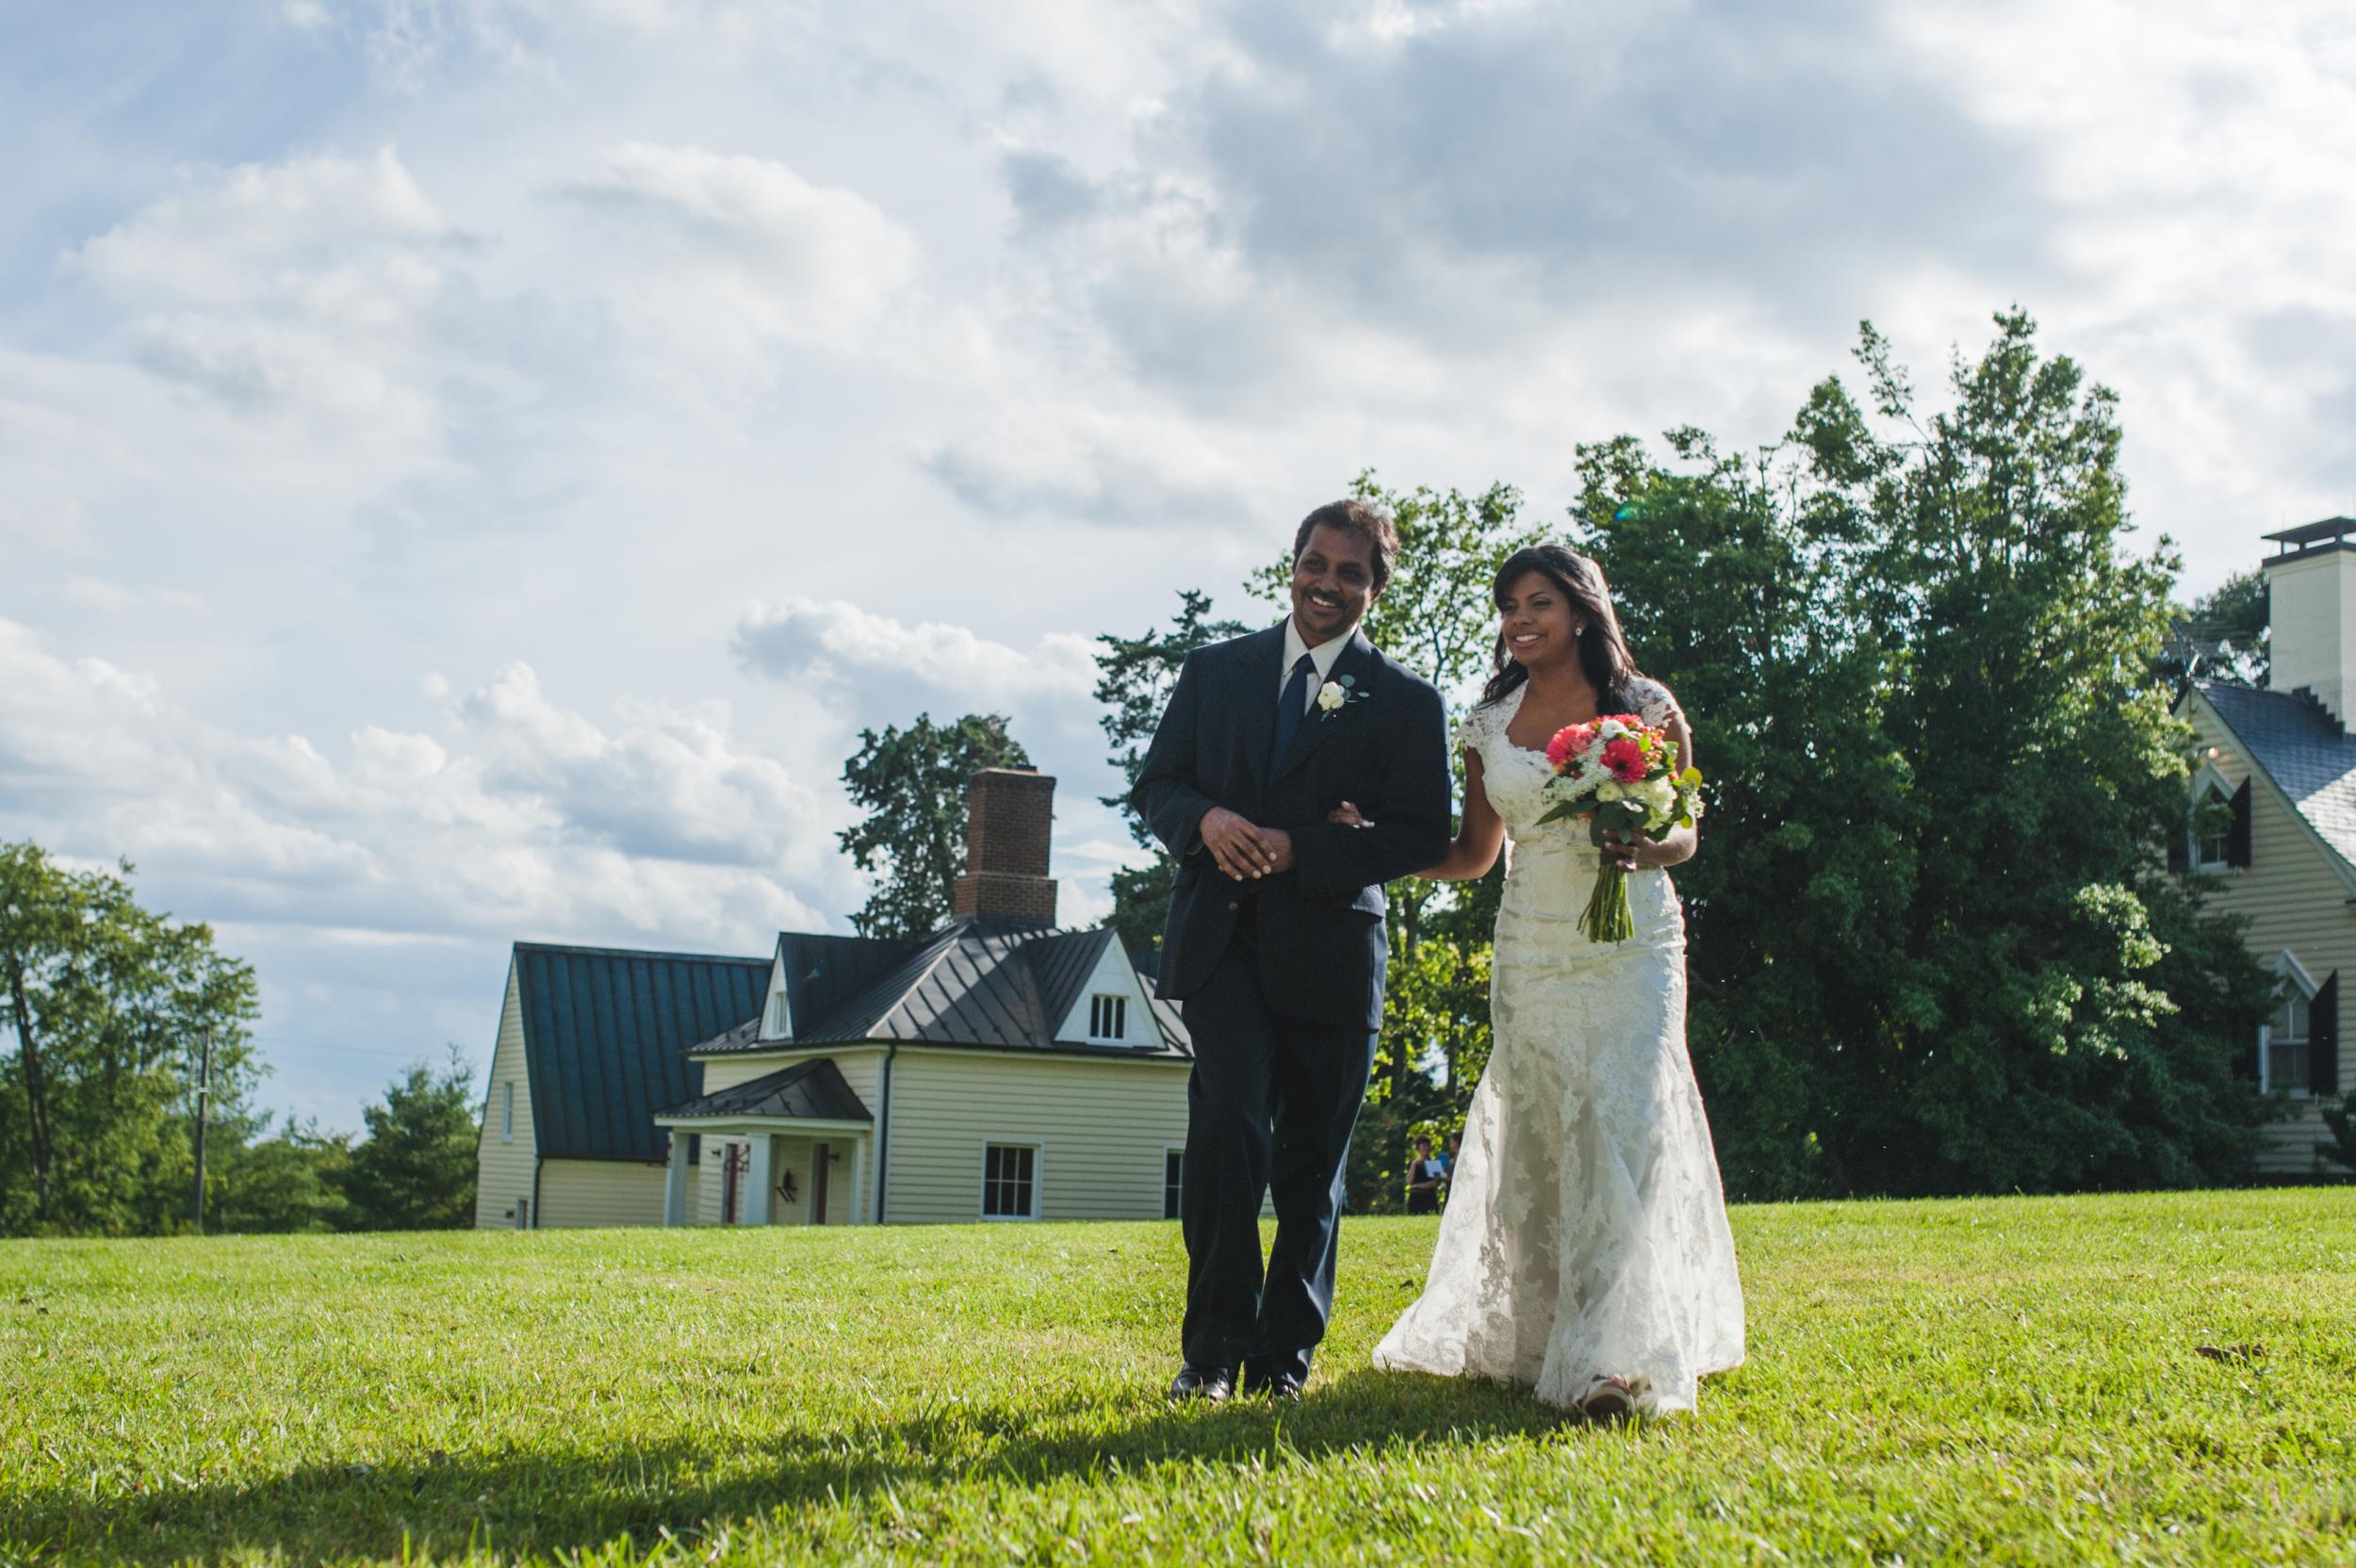 Artistic Wedding Photographer Mantas Kubilinskas-16.jpg